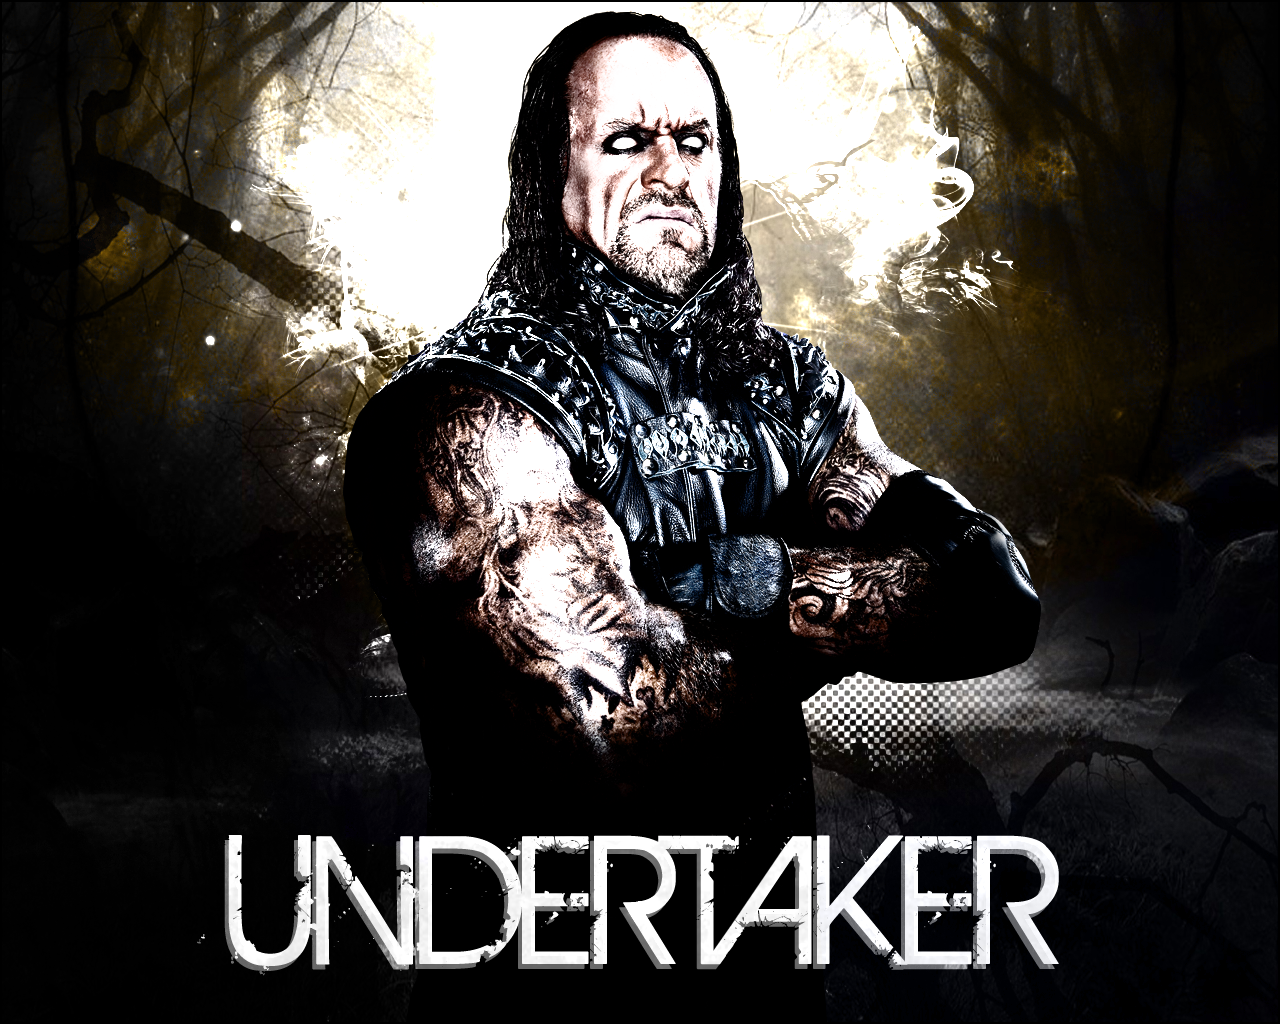 wwe undertaker wallpapers 2013